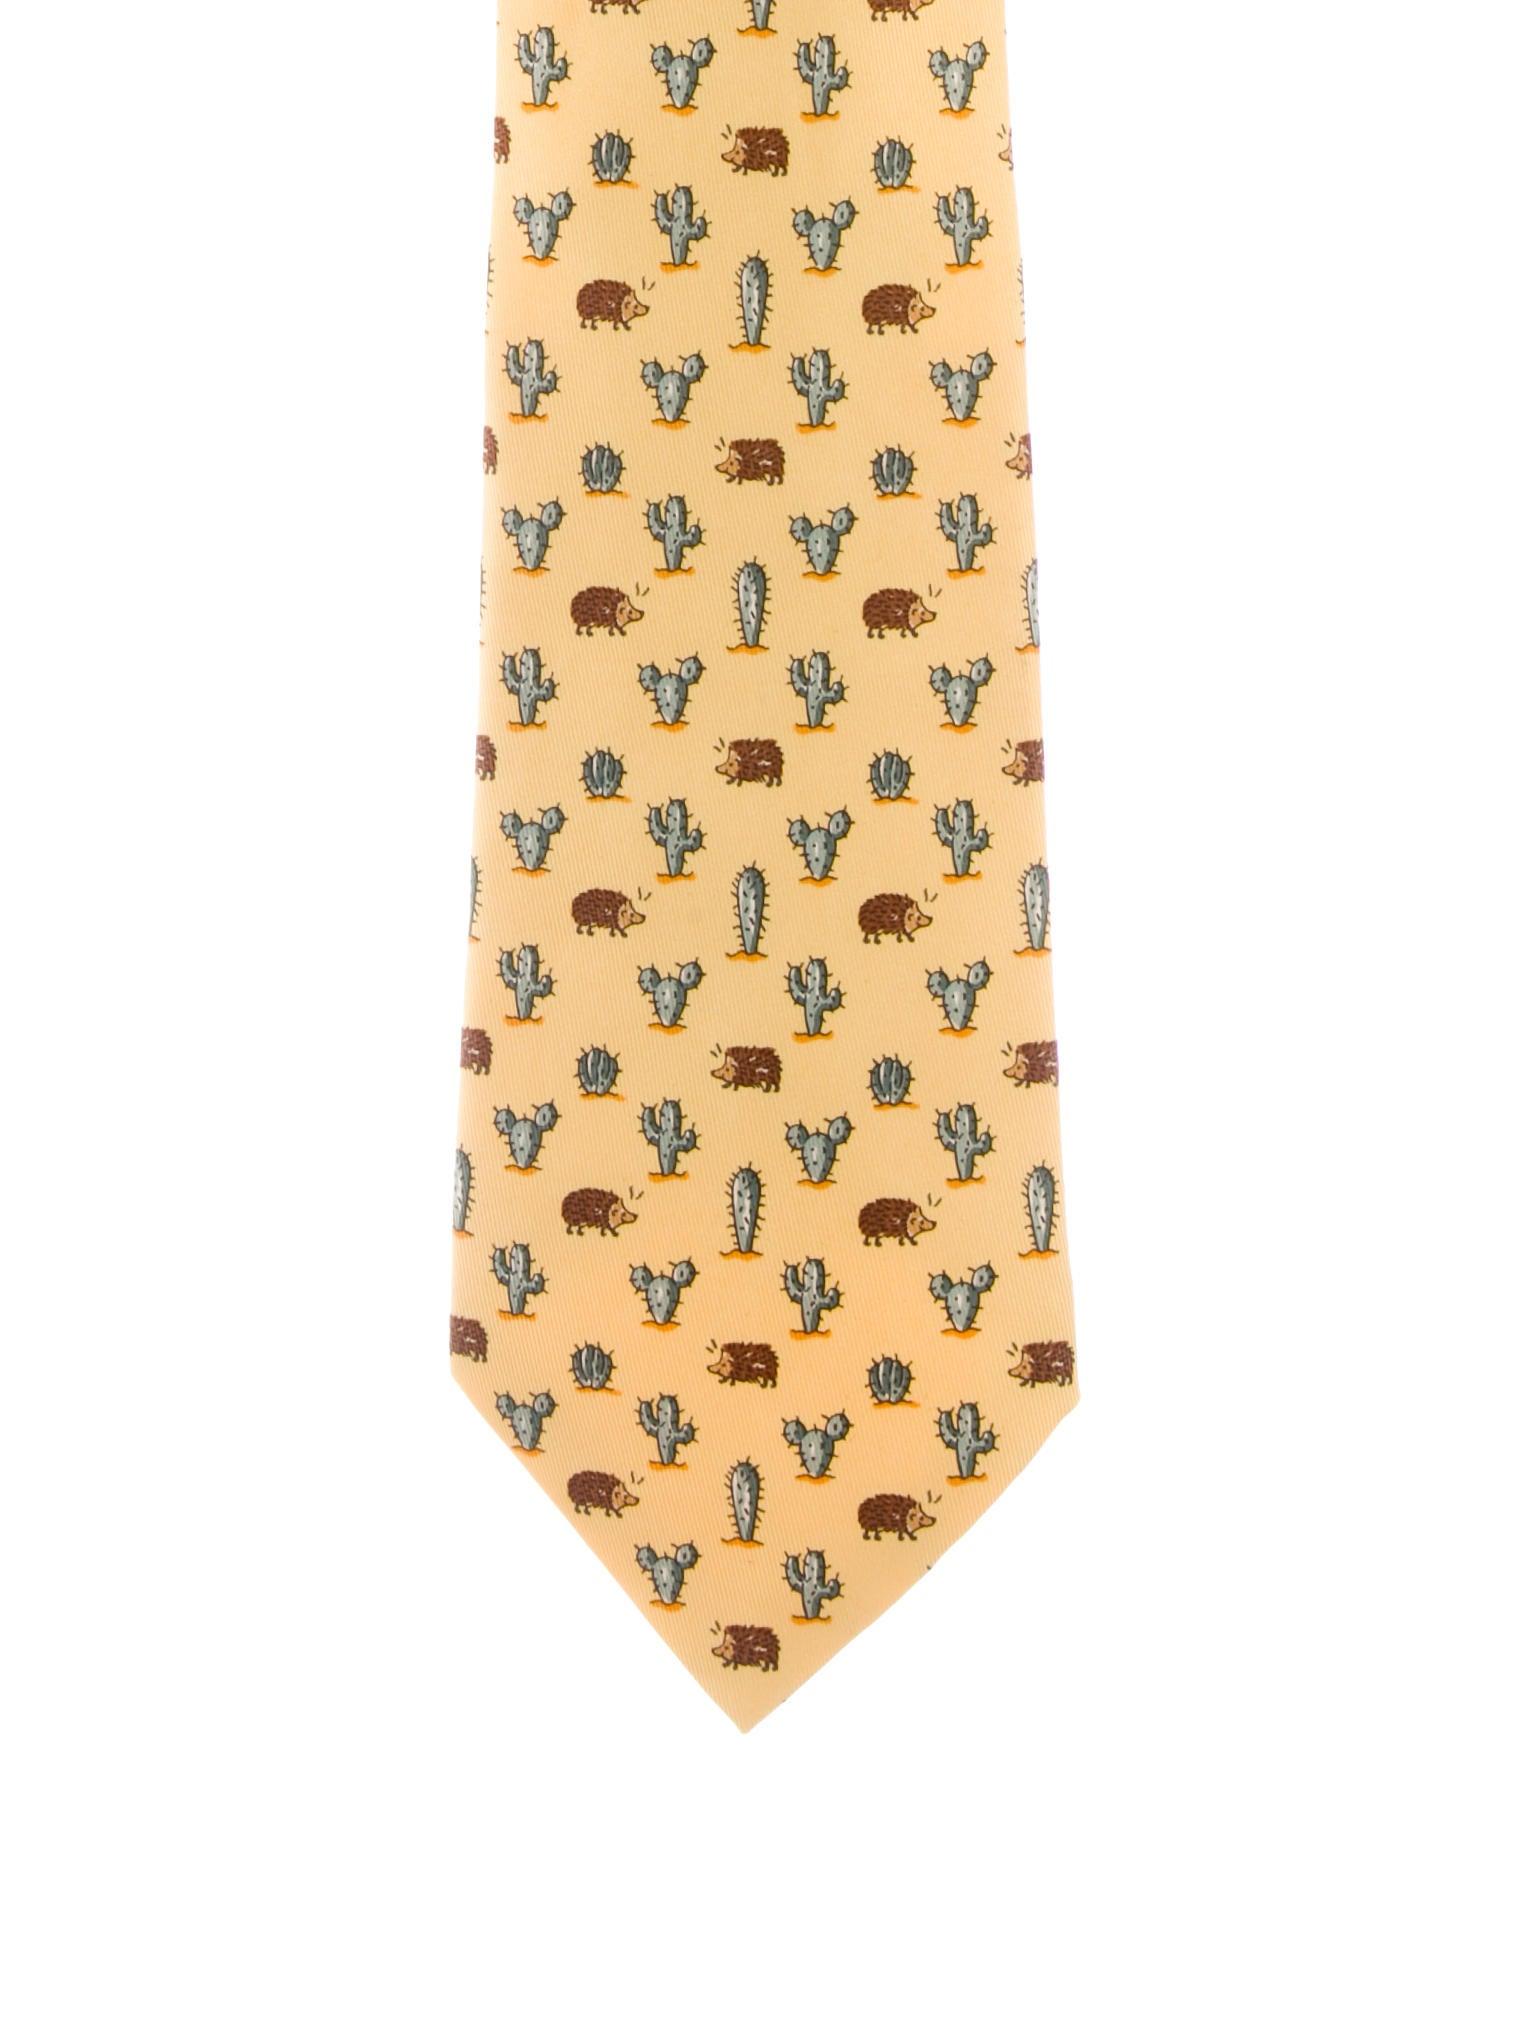 15b4c60a39ec Hermès Cactus Print Silk Tie - Suiting Accessories - HER146007 | The ...